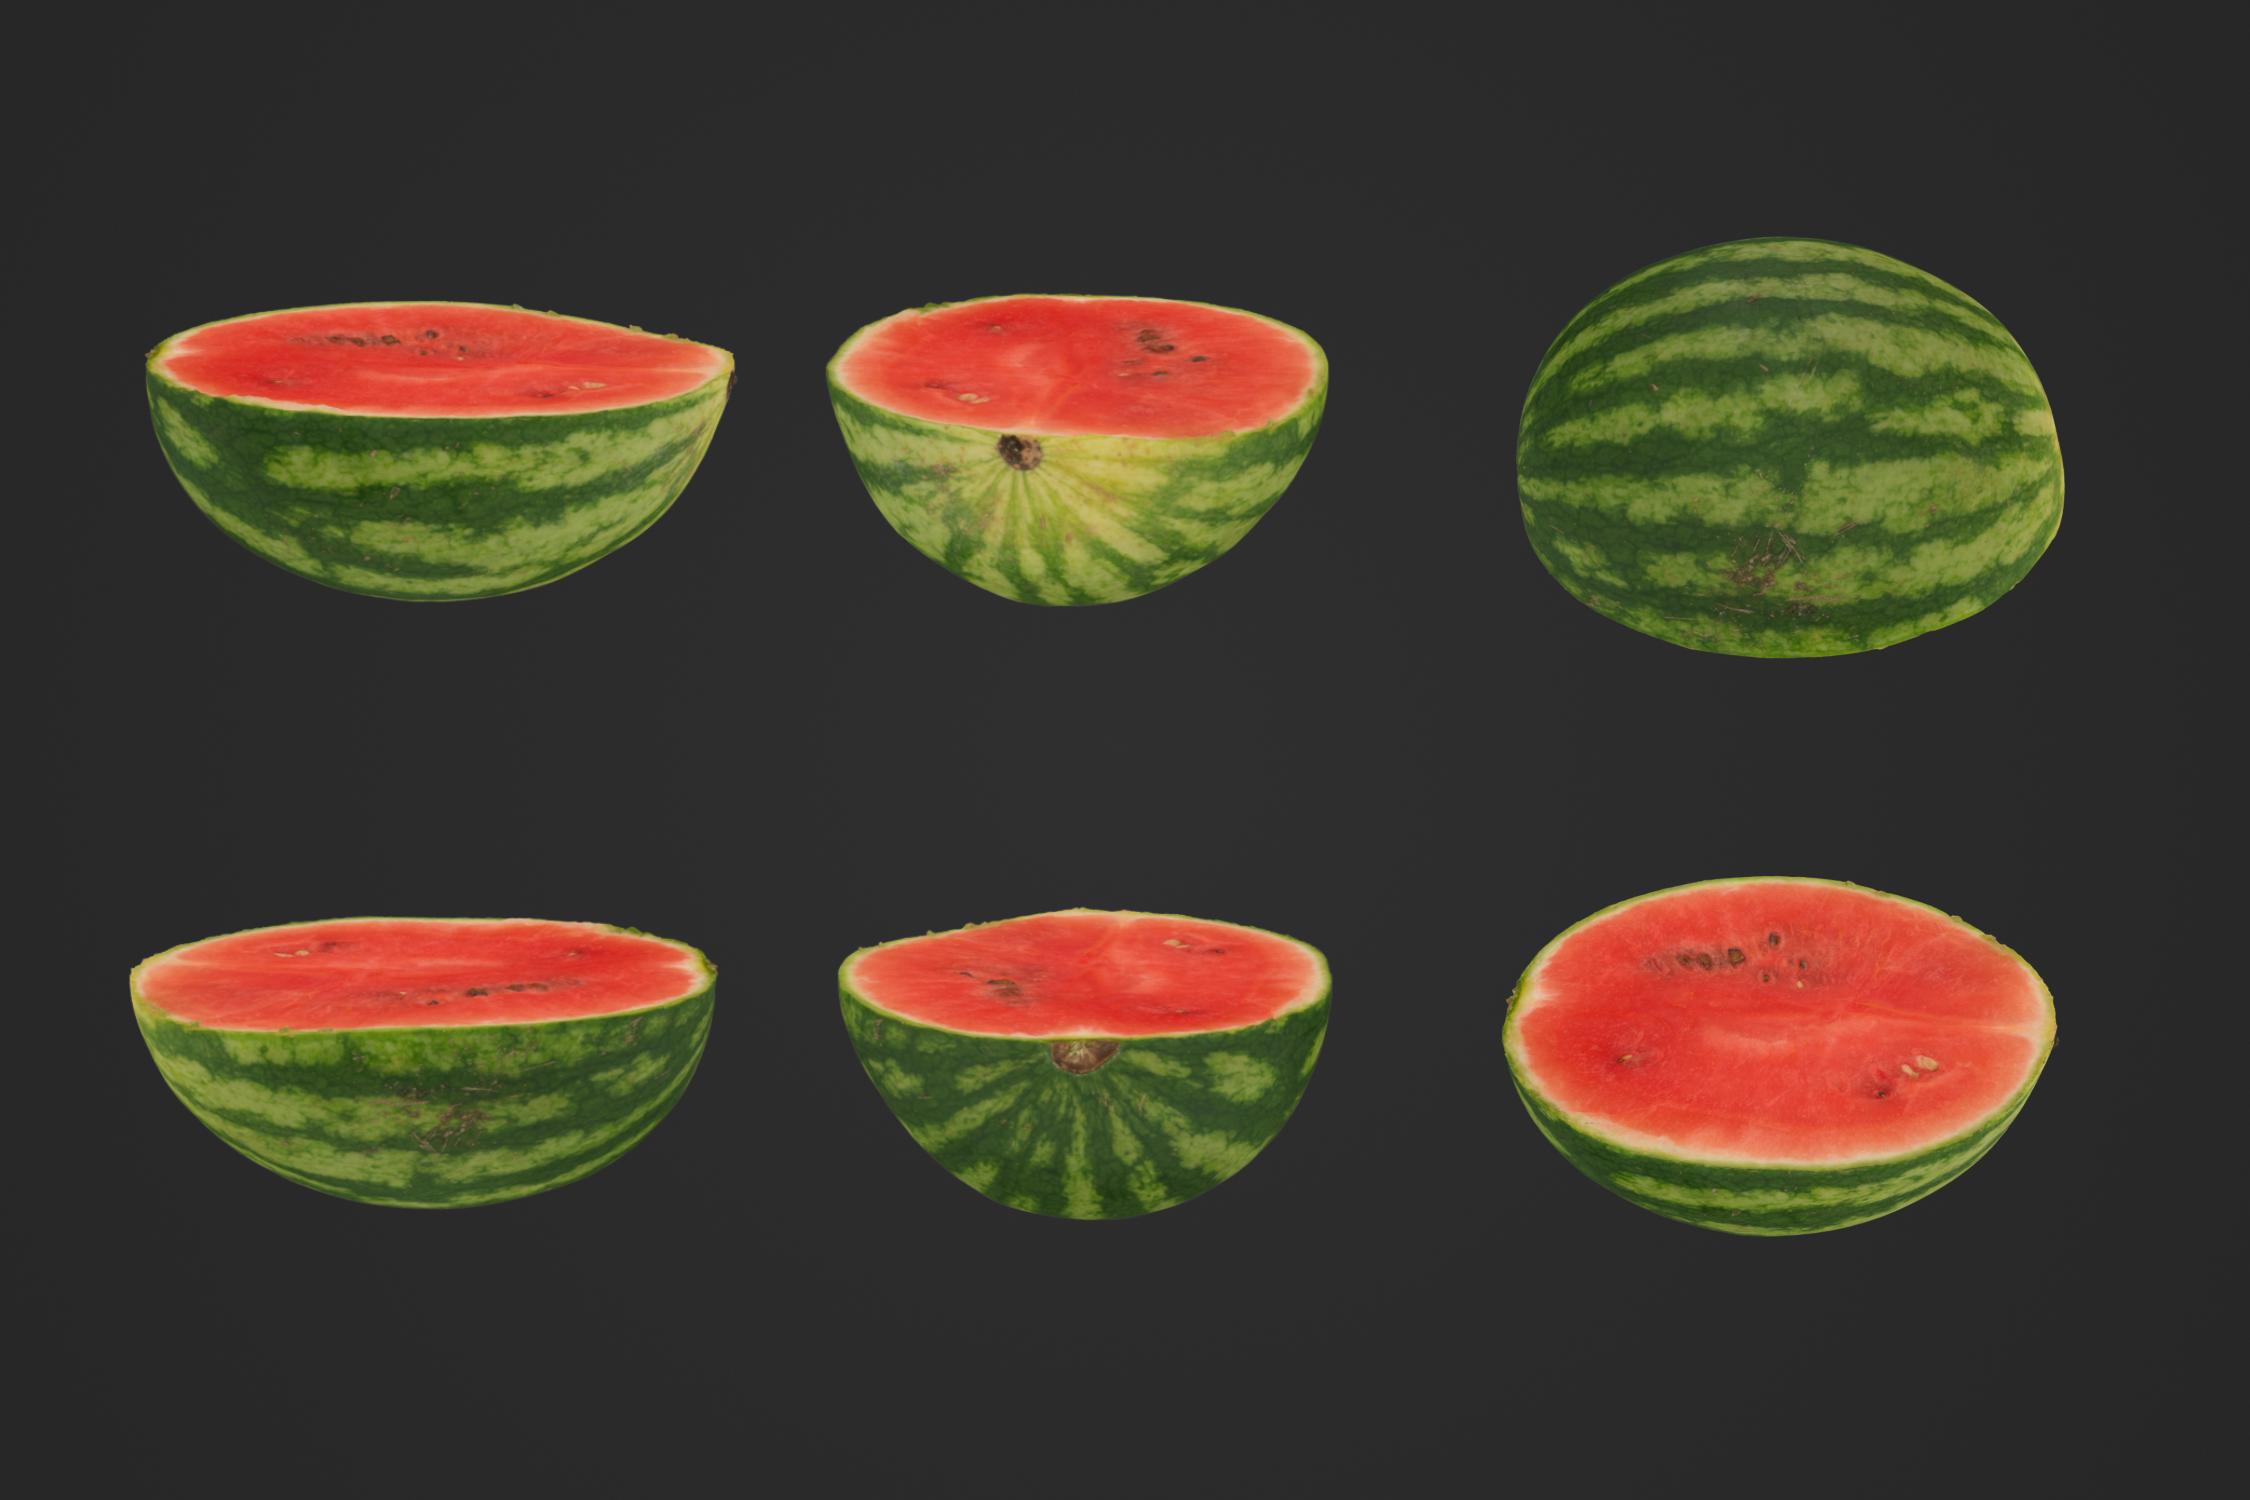 Half_Watermelon_1_1.jpg